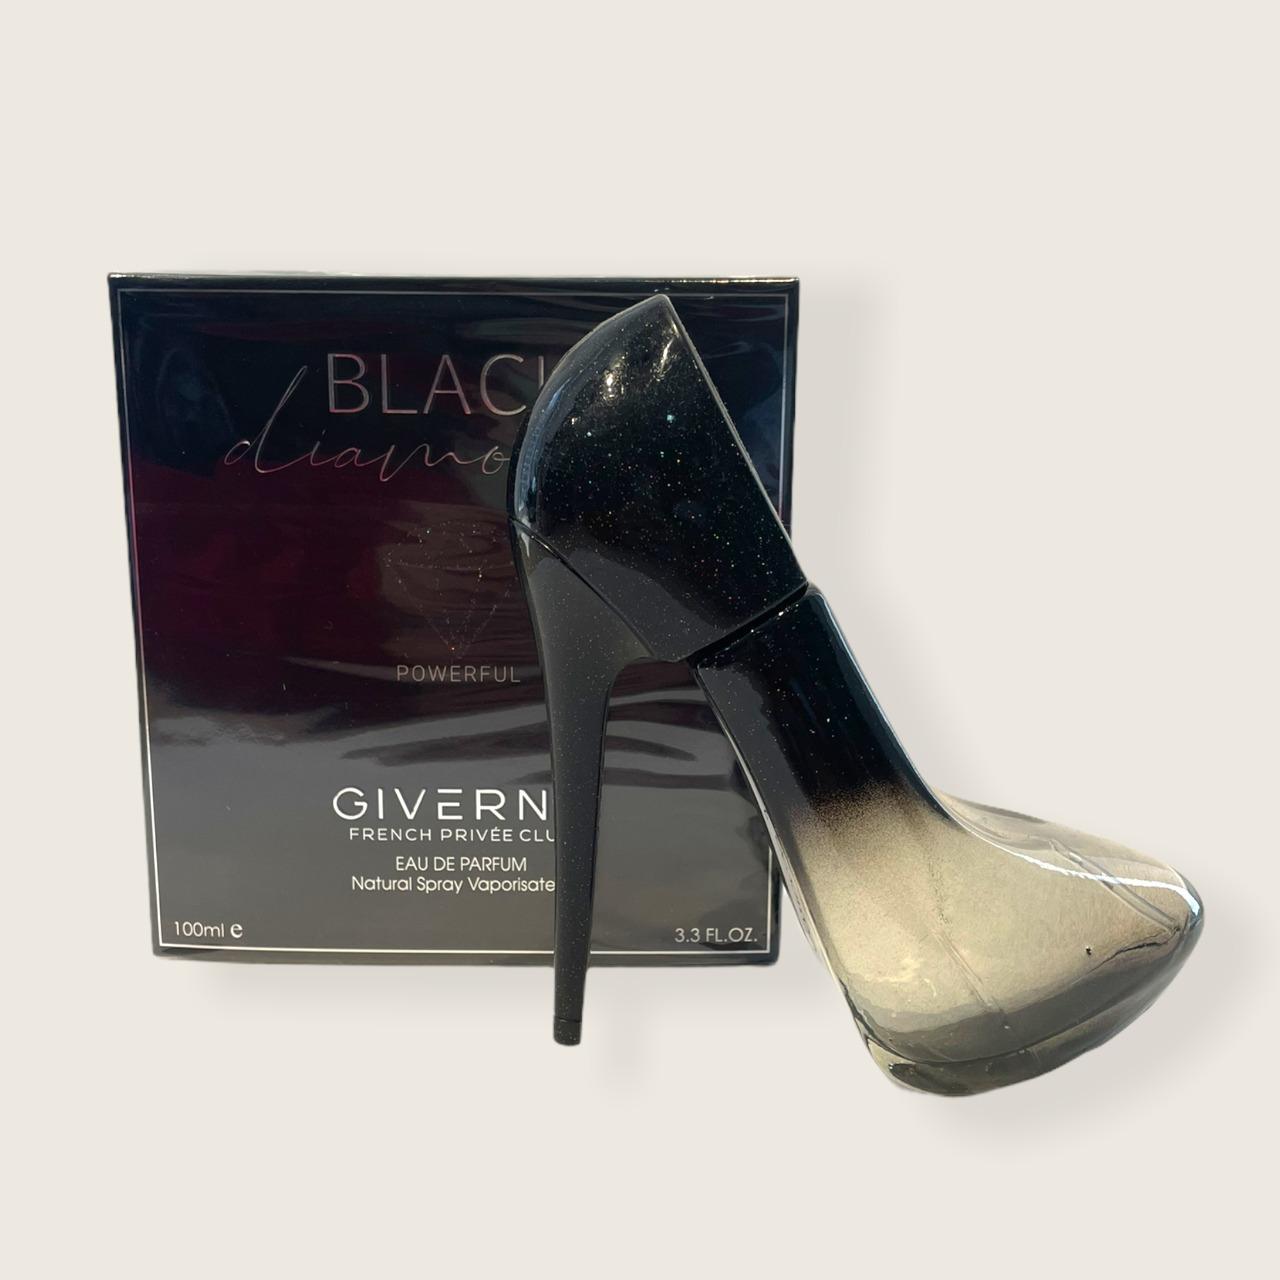 Black Diamond Powerful Giverny Eau de Parfum 100ml